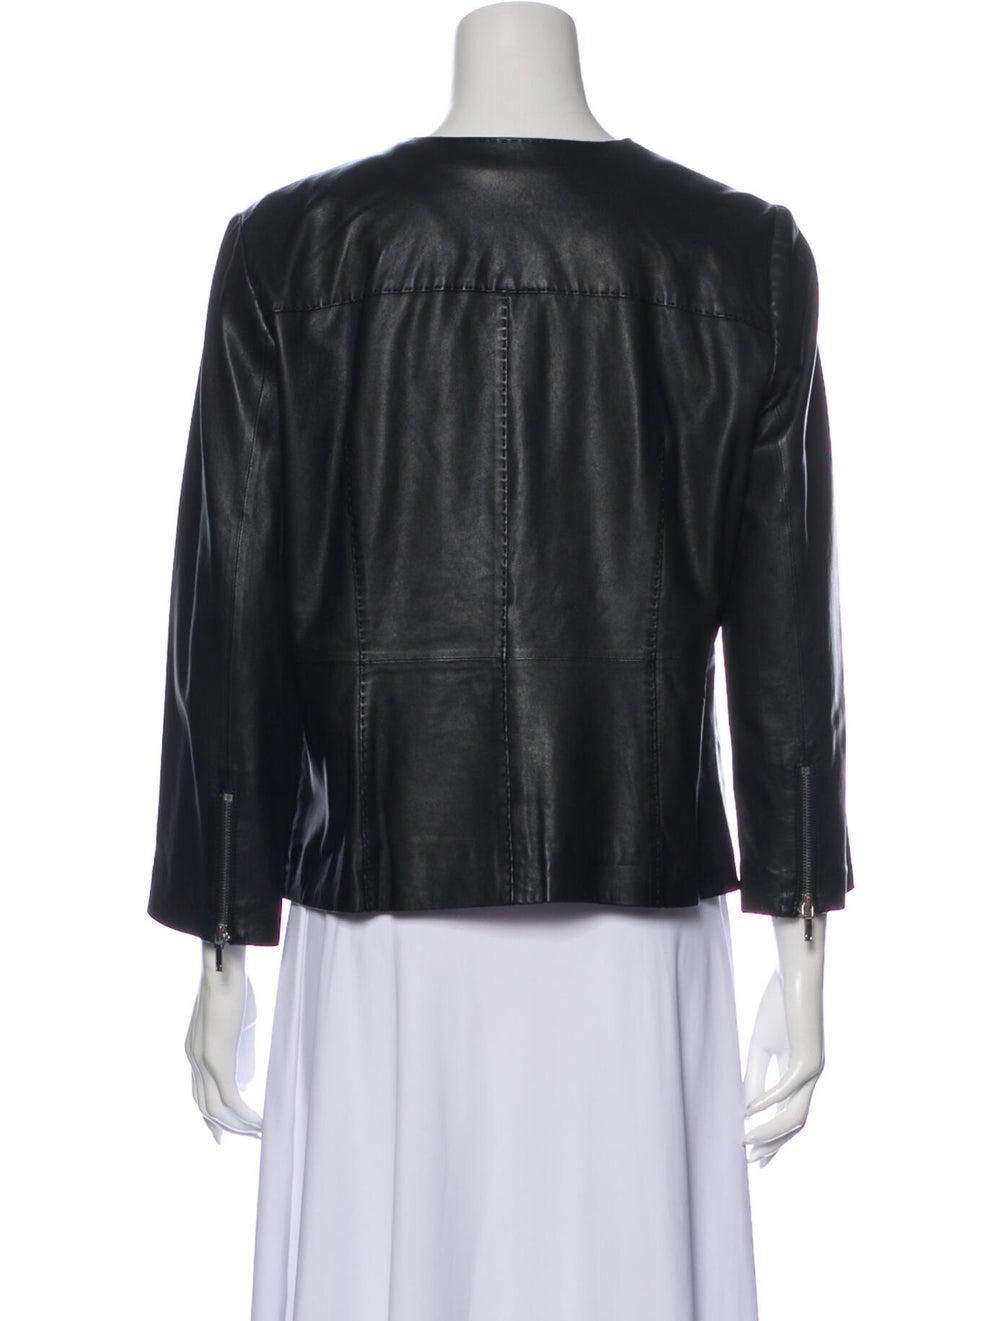 Tory Burch Leather Jacket Black - image 3